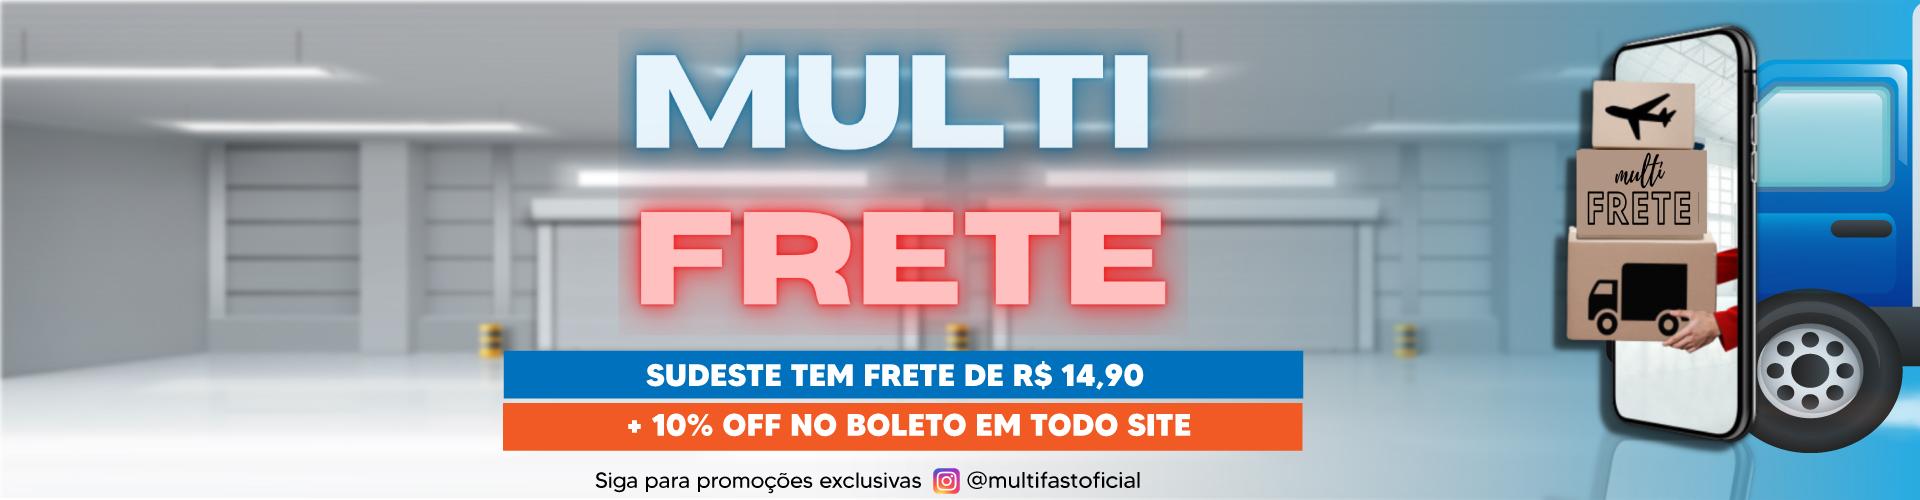 Principal Multifrete R$ 14,90 - Desktop